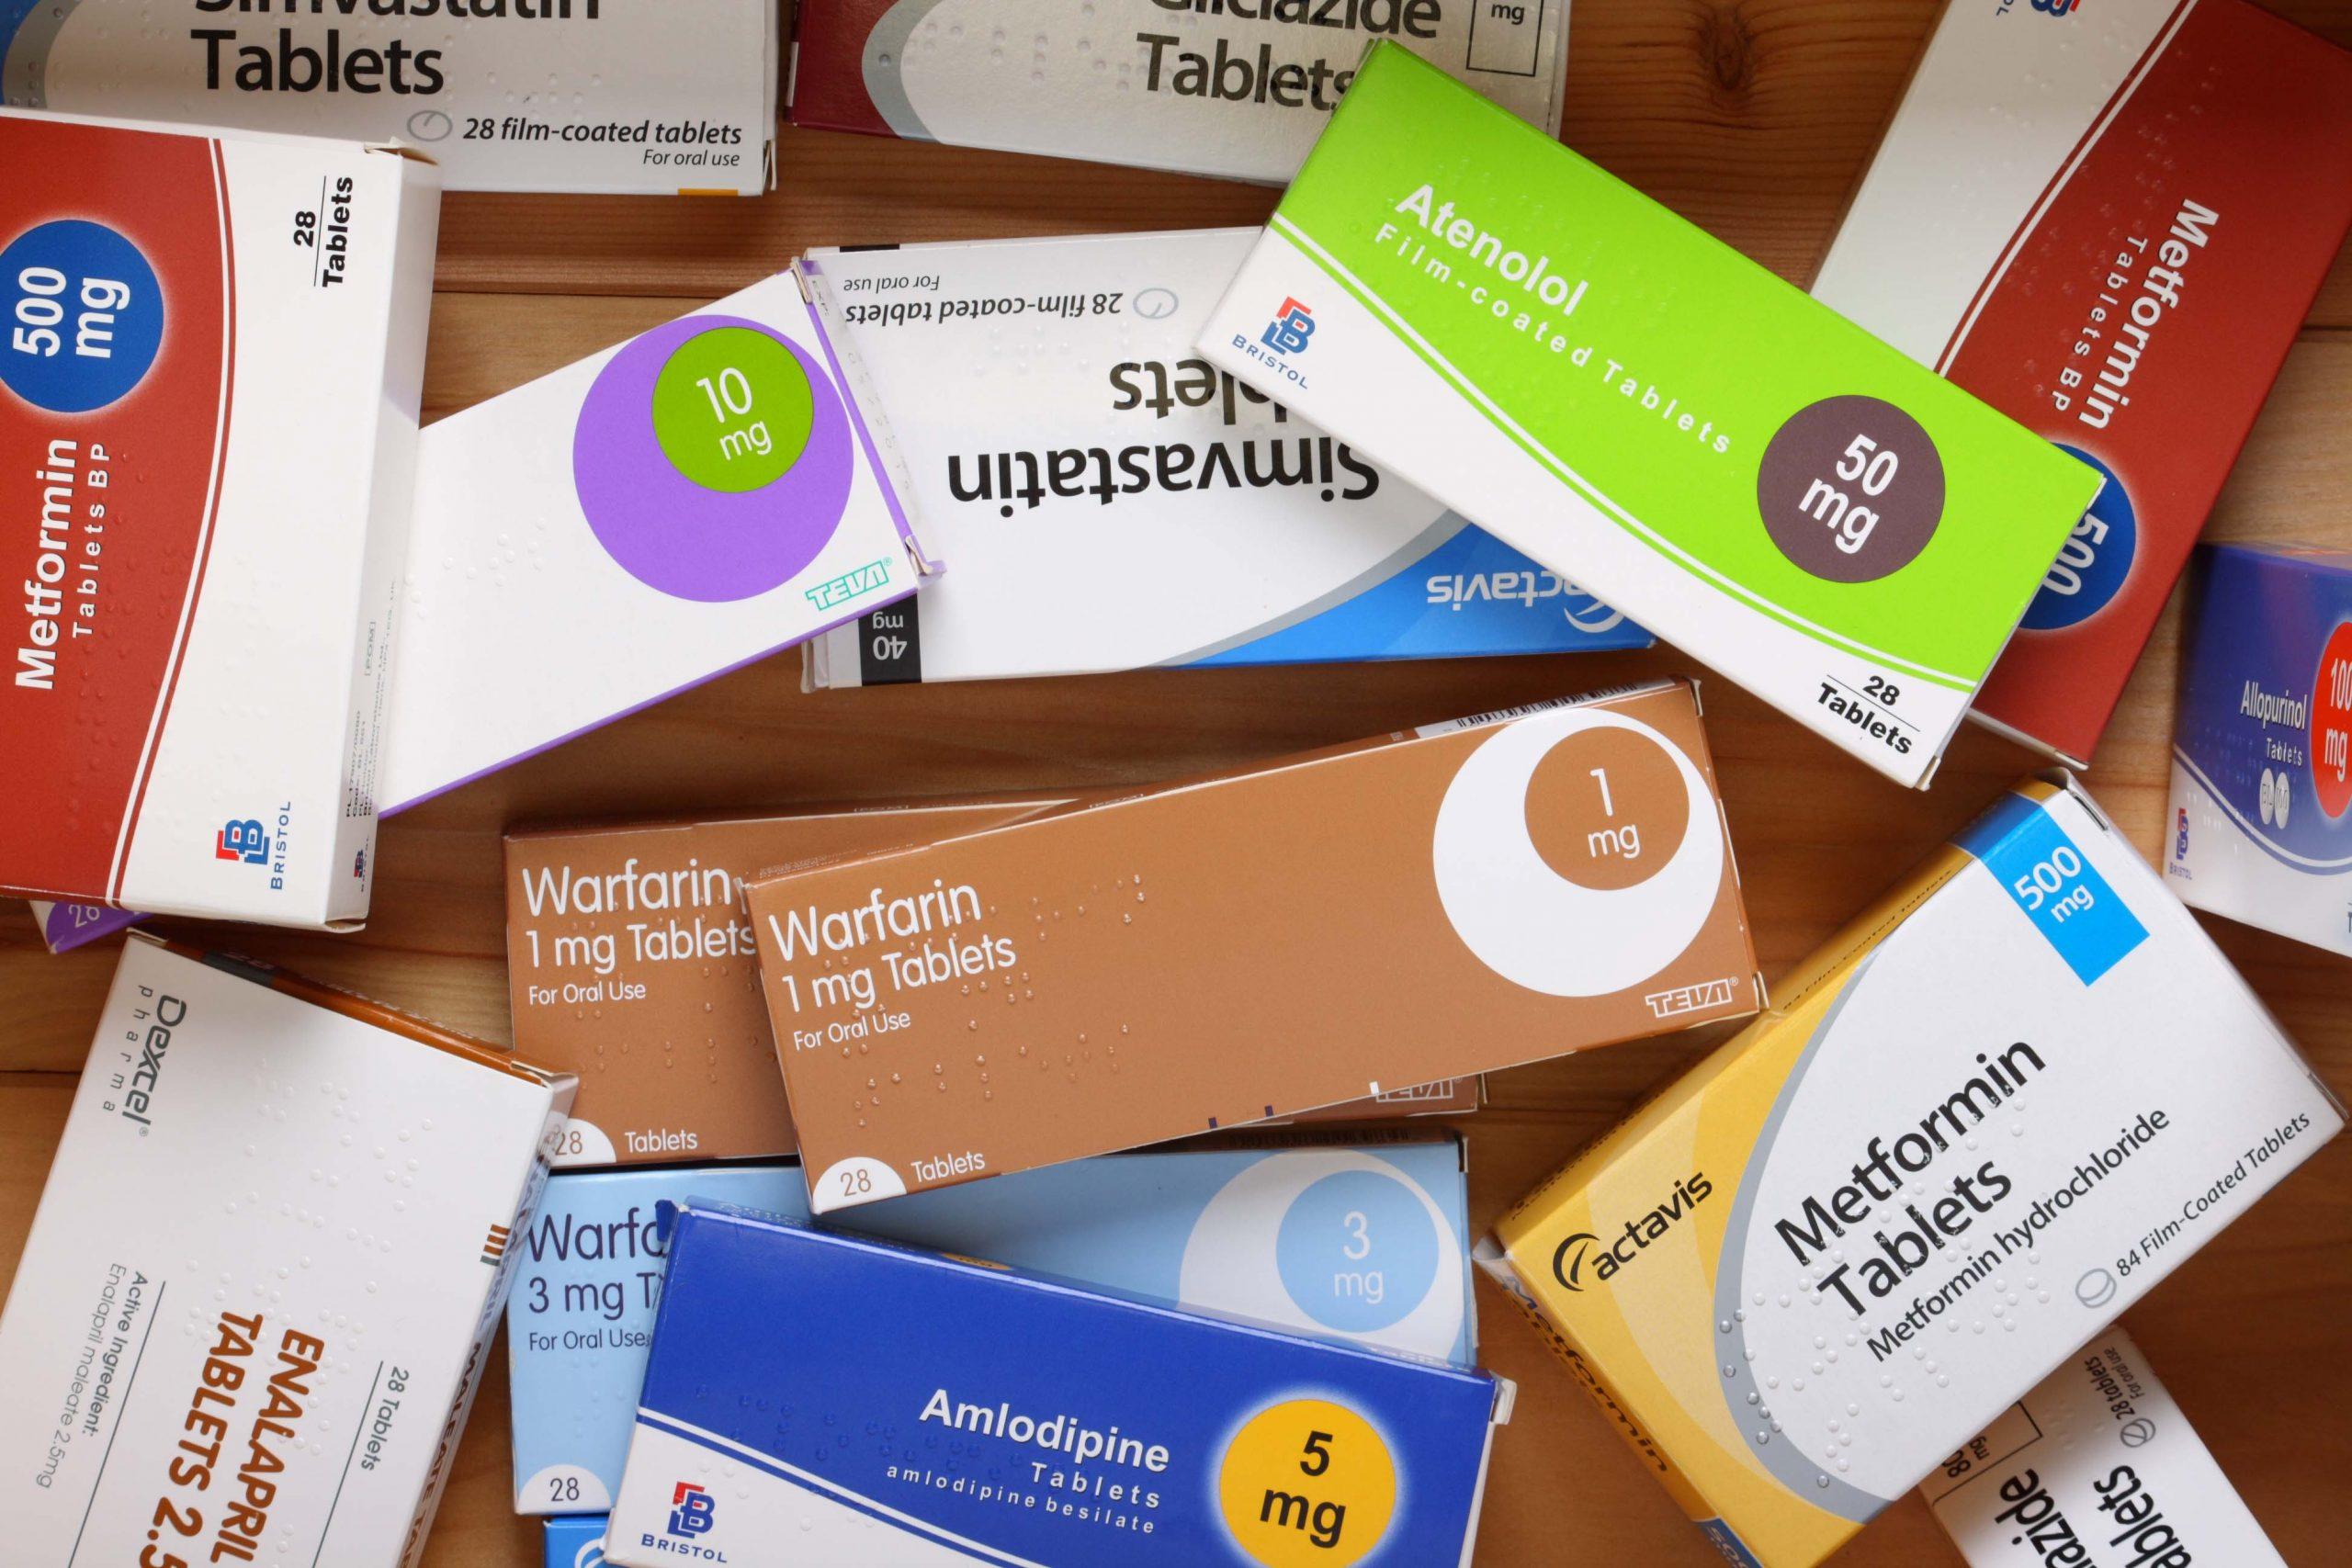 Hot Chemist Medicines Disposal